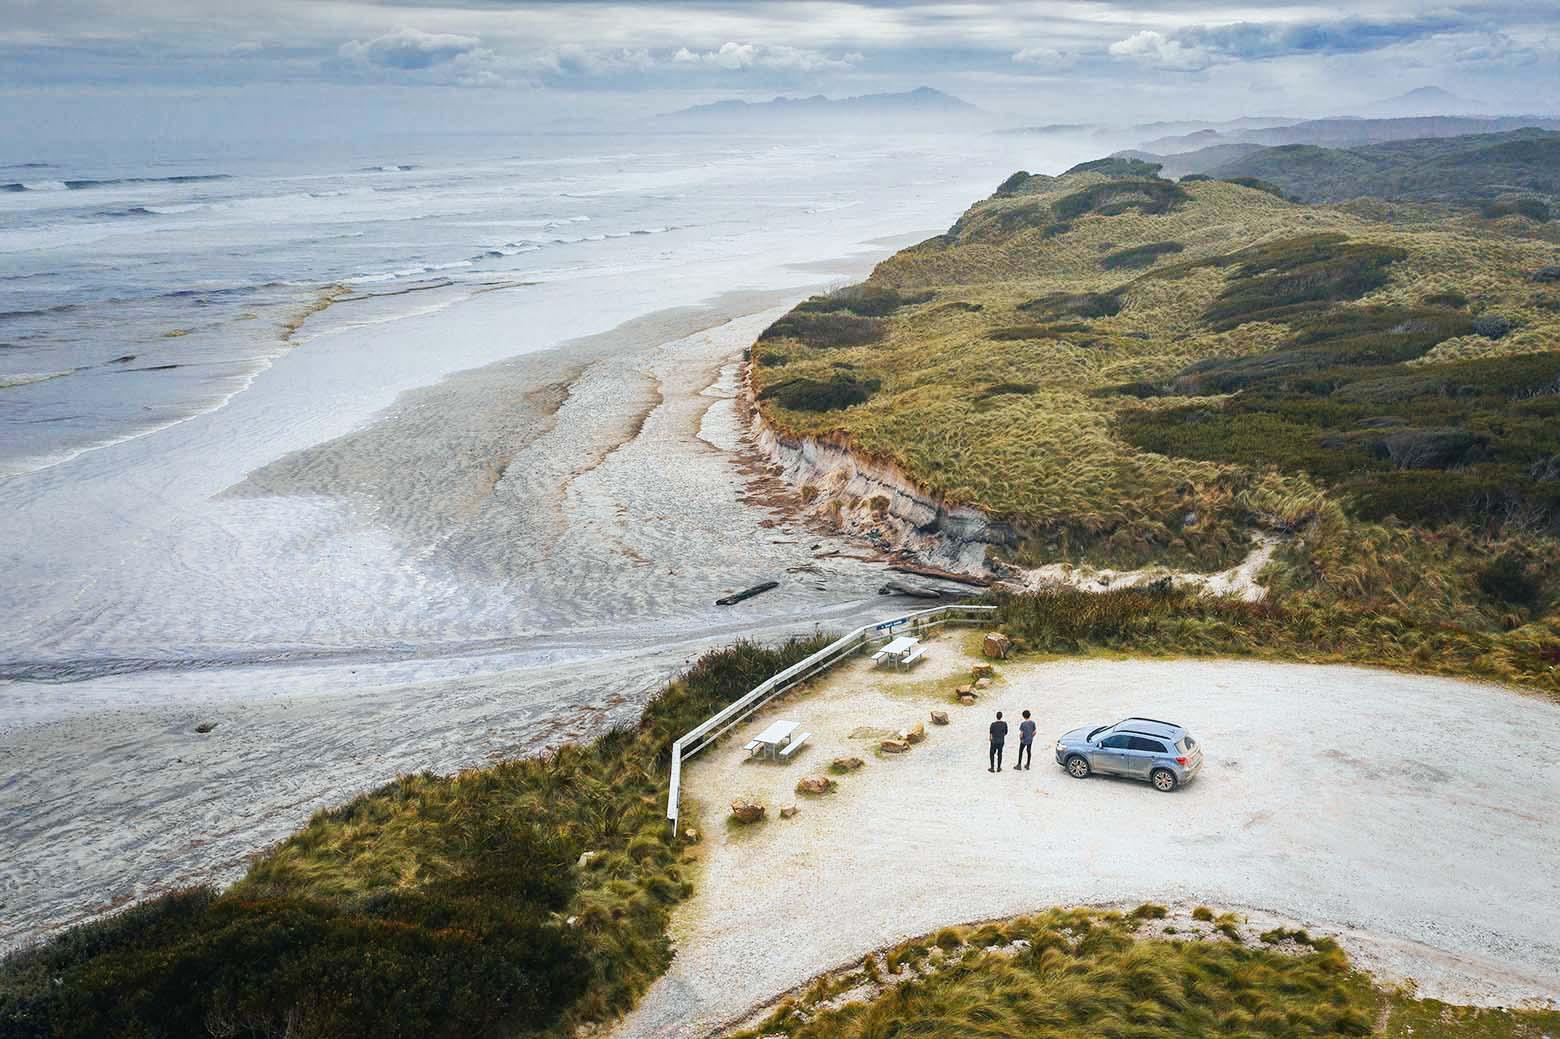 Ocean Beach Lookout - Tasmania itinerary (7 days)